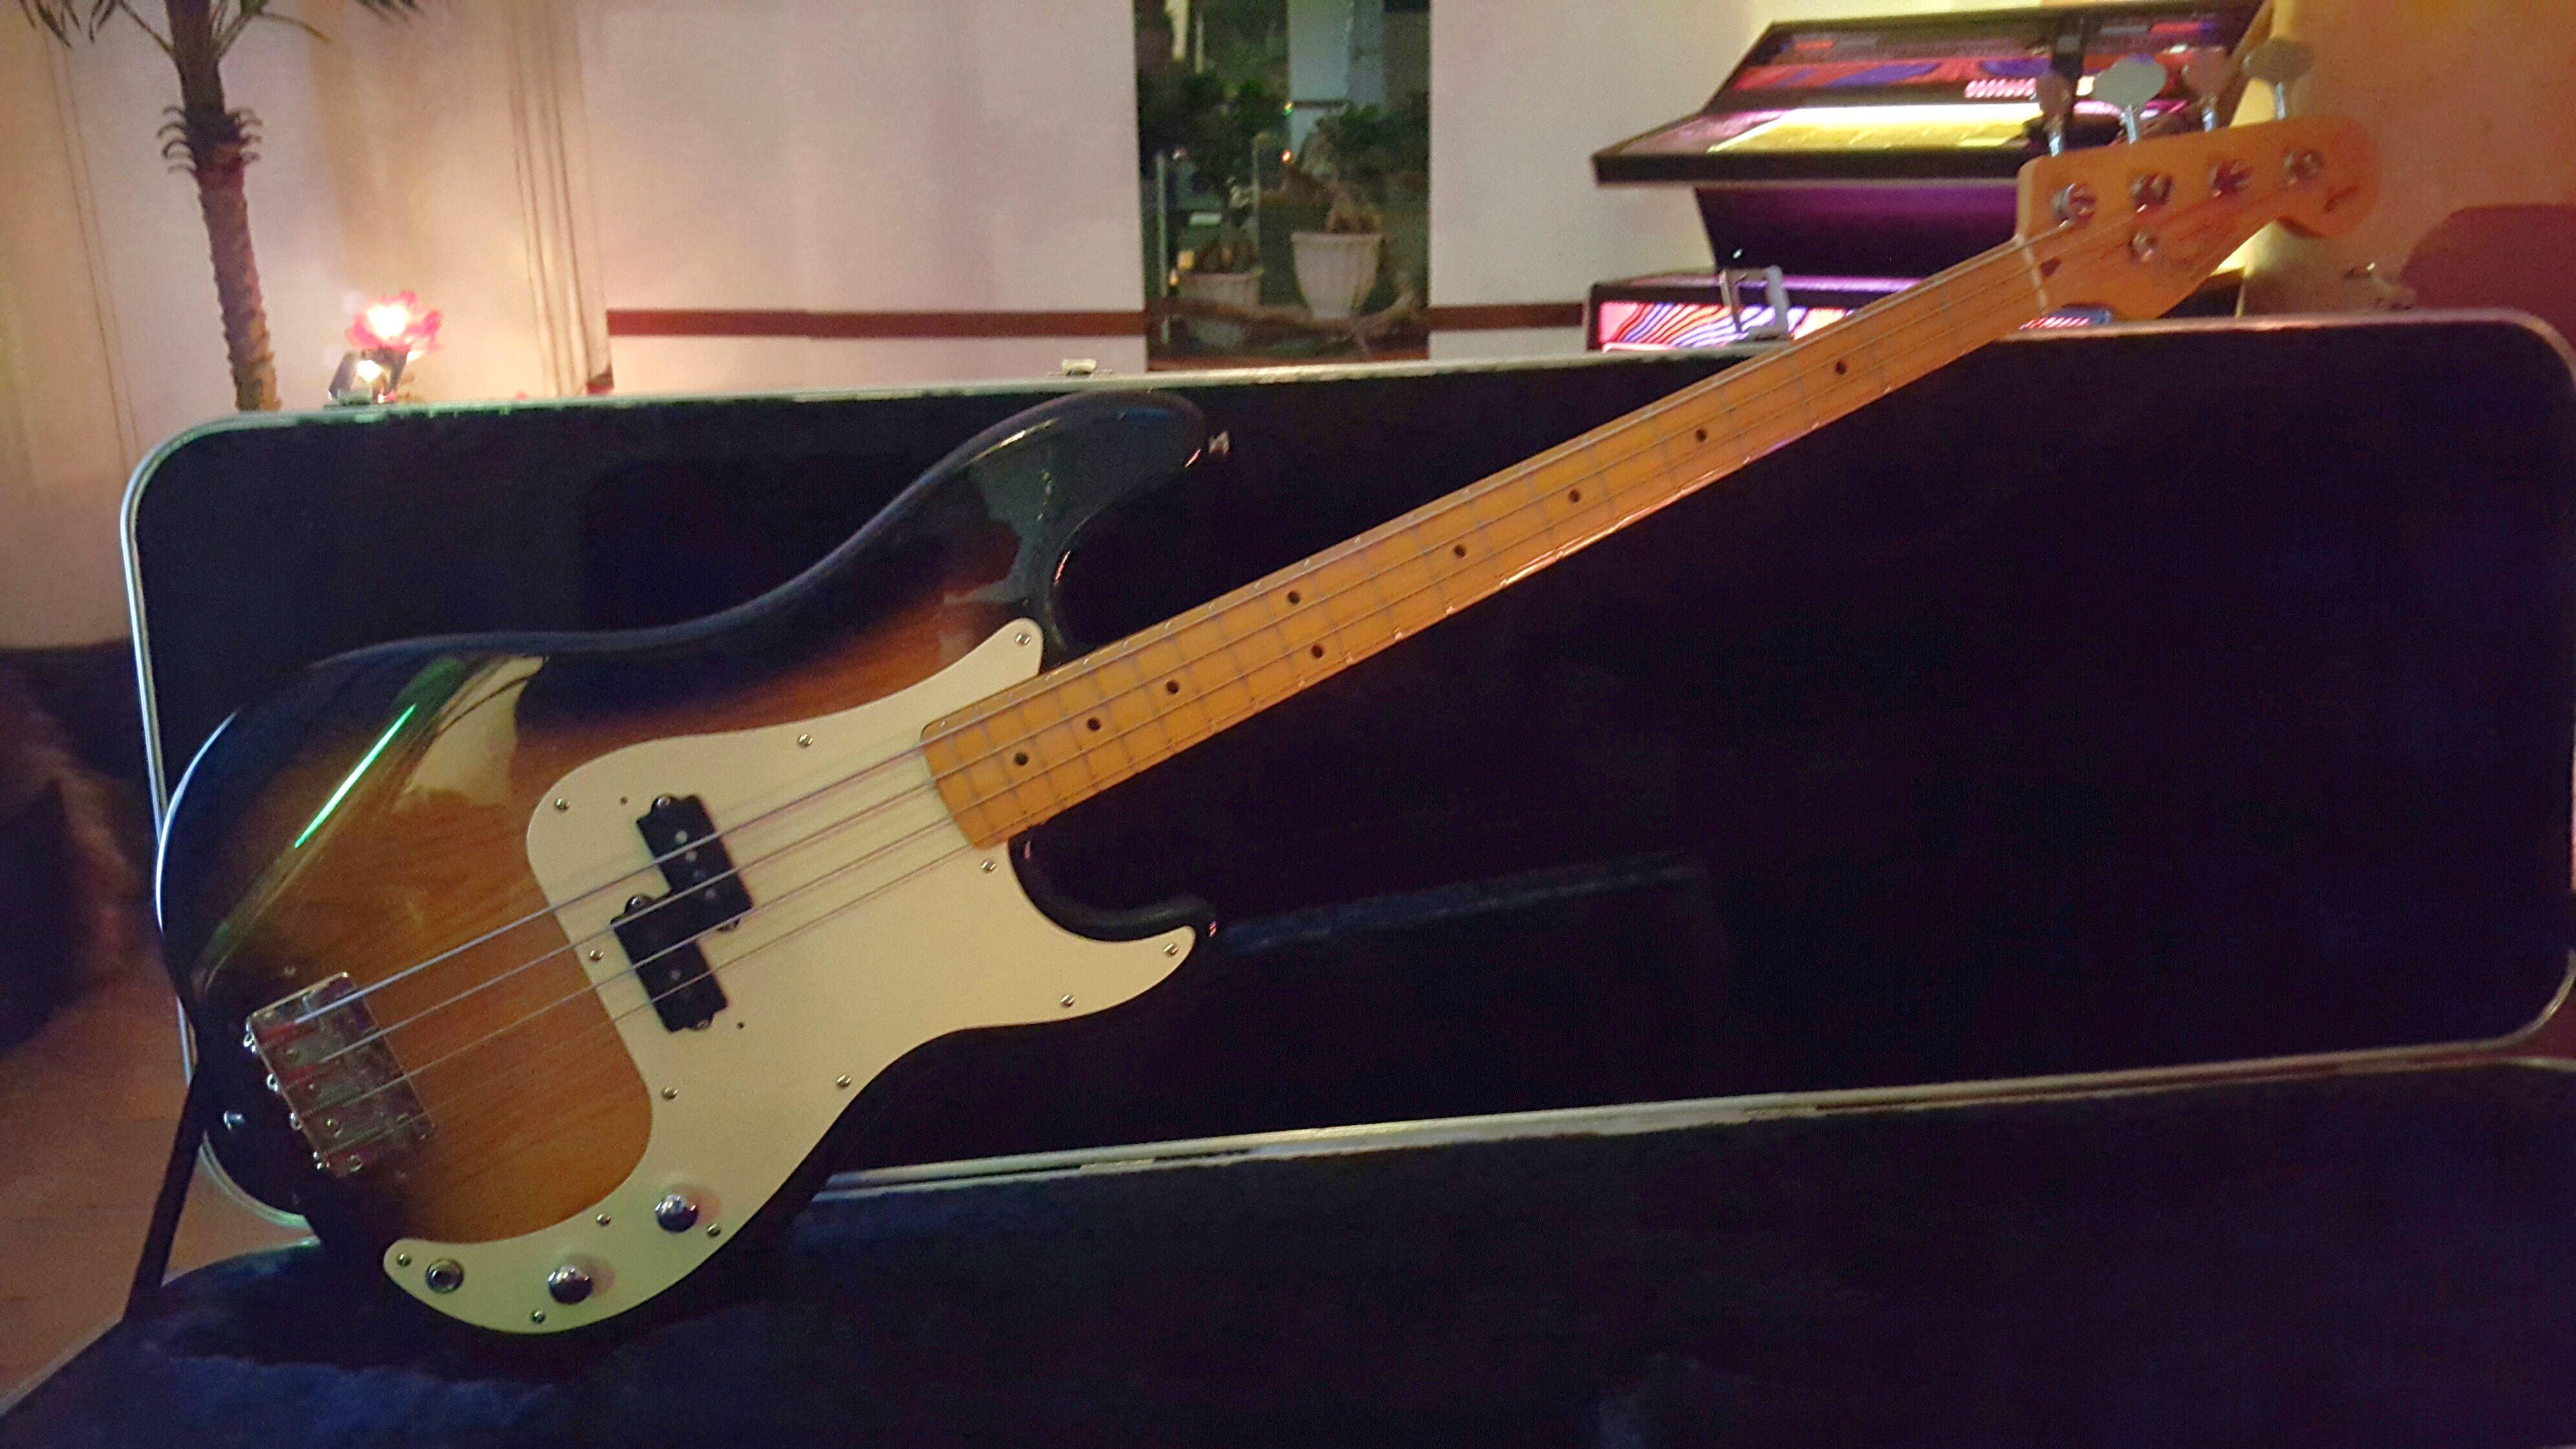 Basses Article Panpot Guitar Rewiring Spector Performer Classic Series